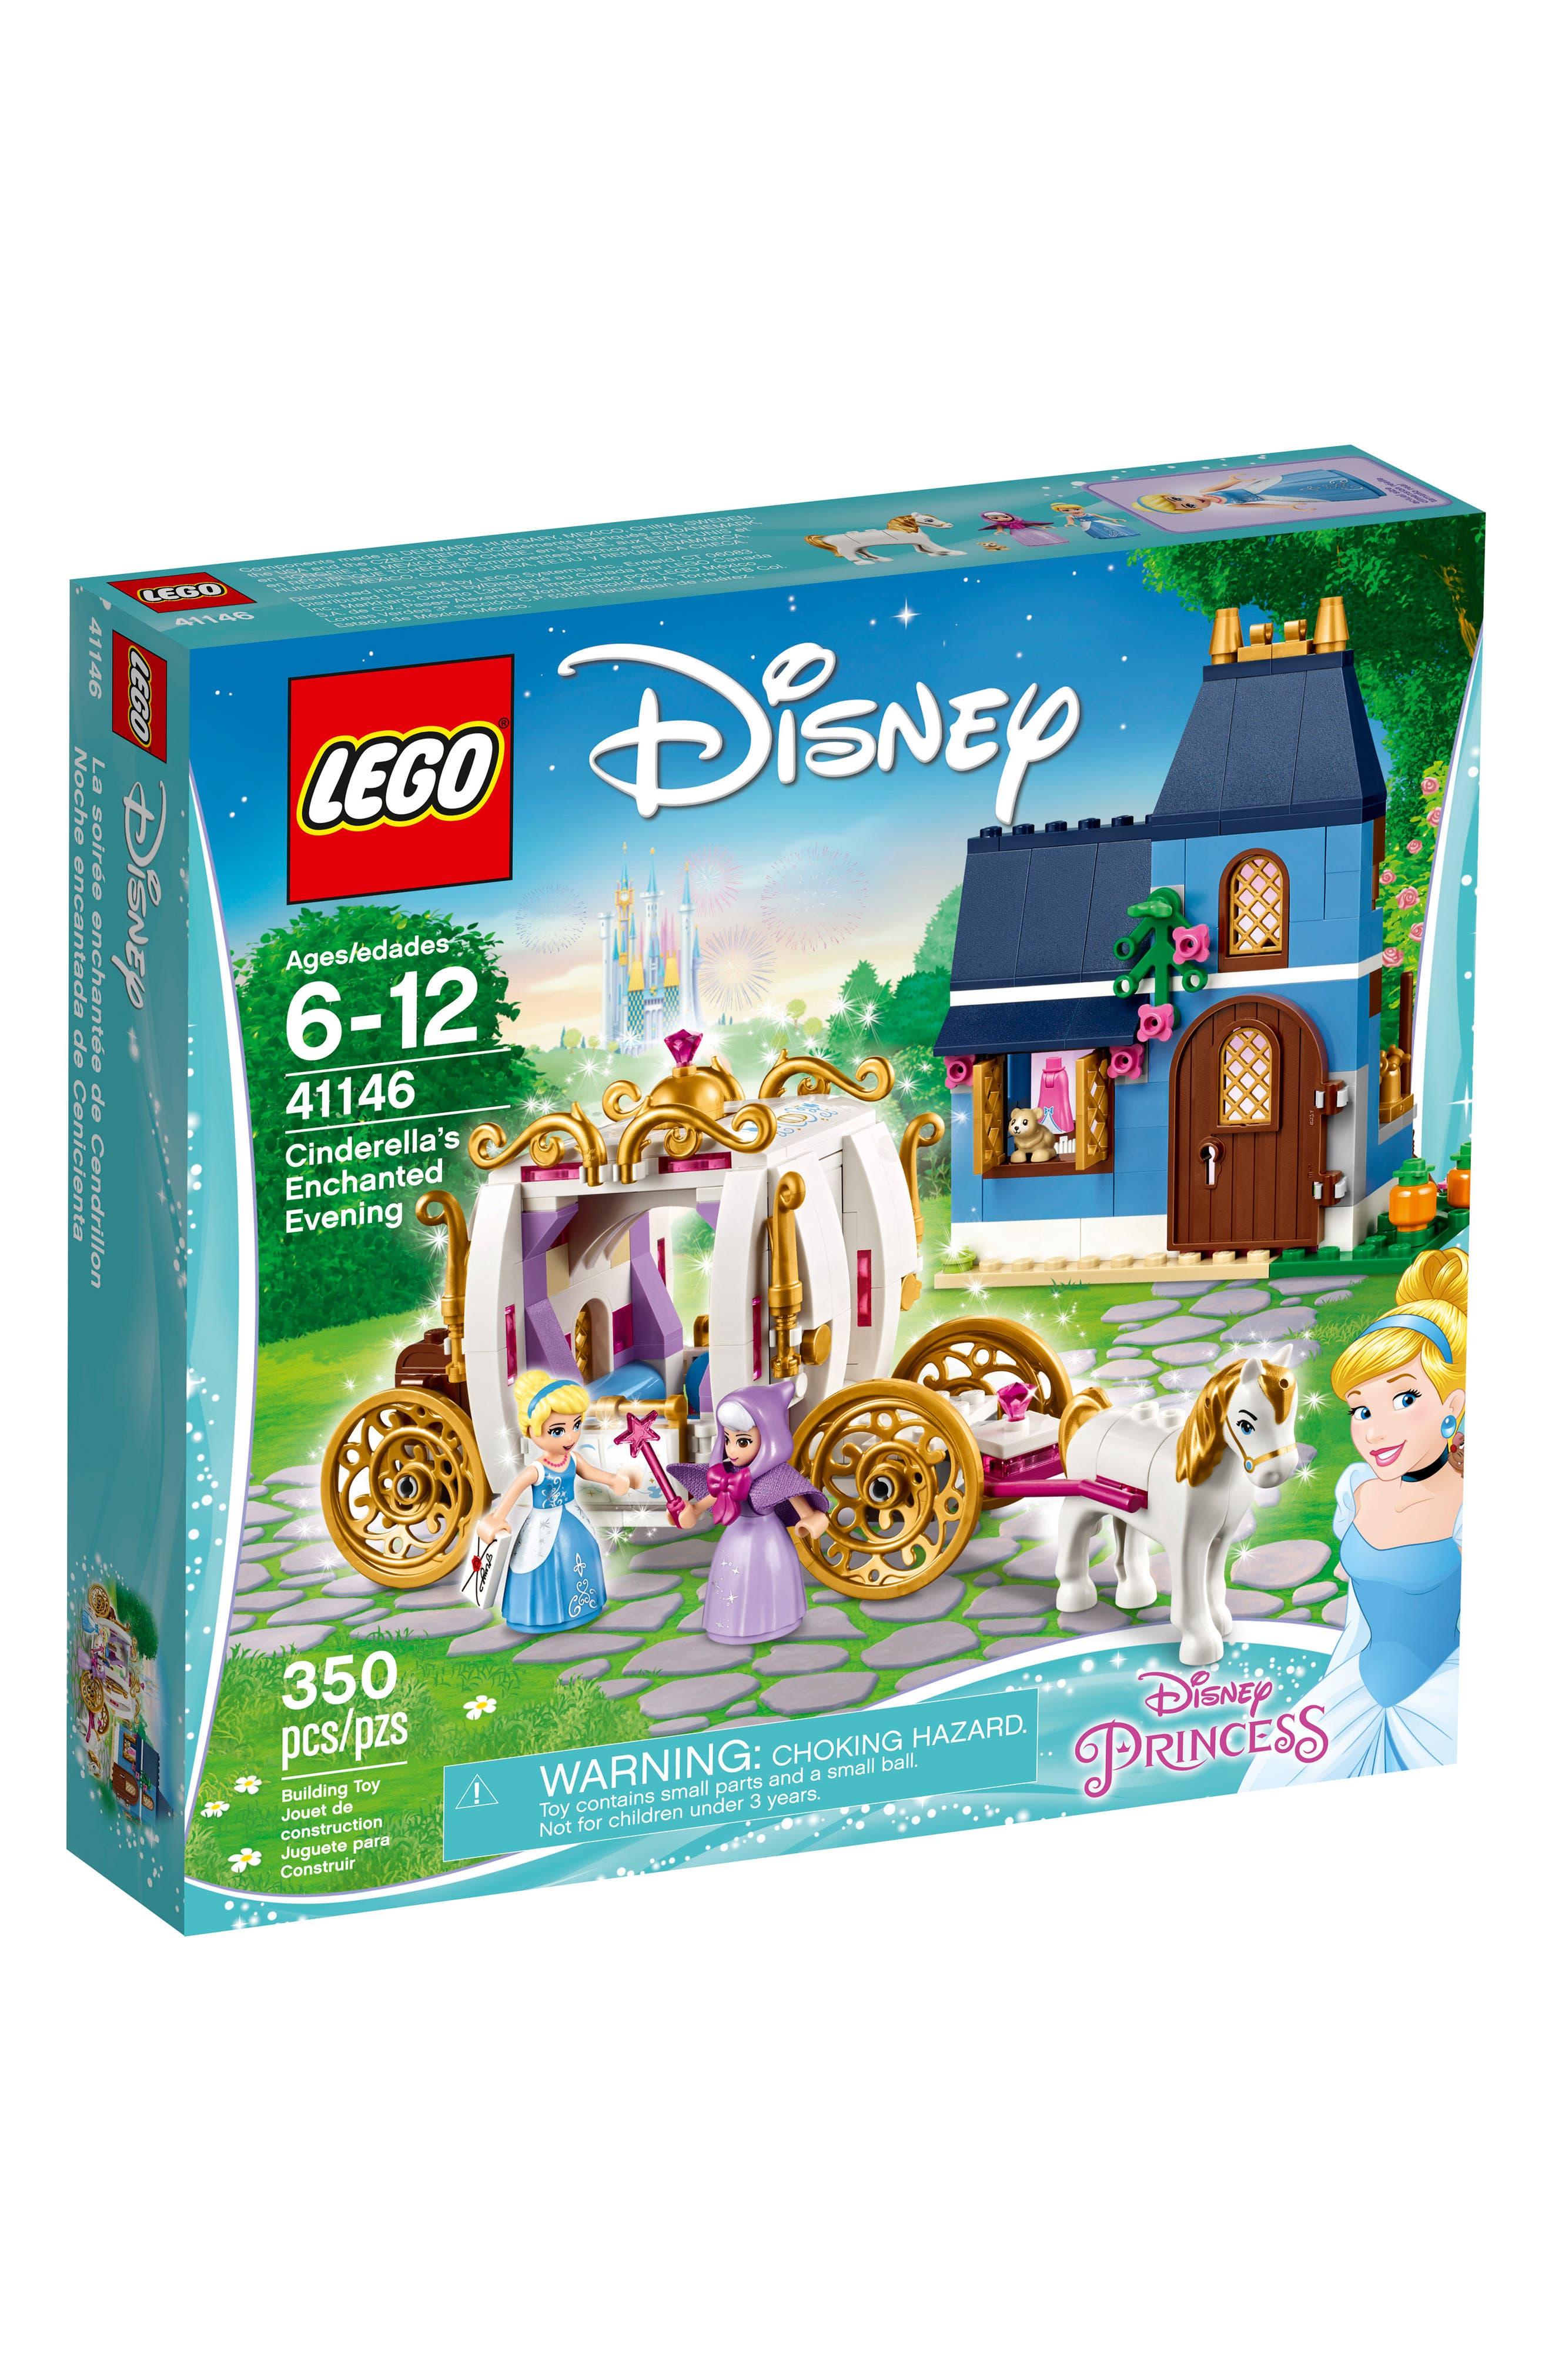 Disney<sup>™</sup> Cinderella's Enchanted Evening Play Set - 41146,                             Main thumbnail 1, color,                             Multi